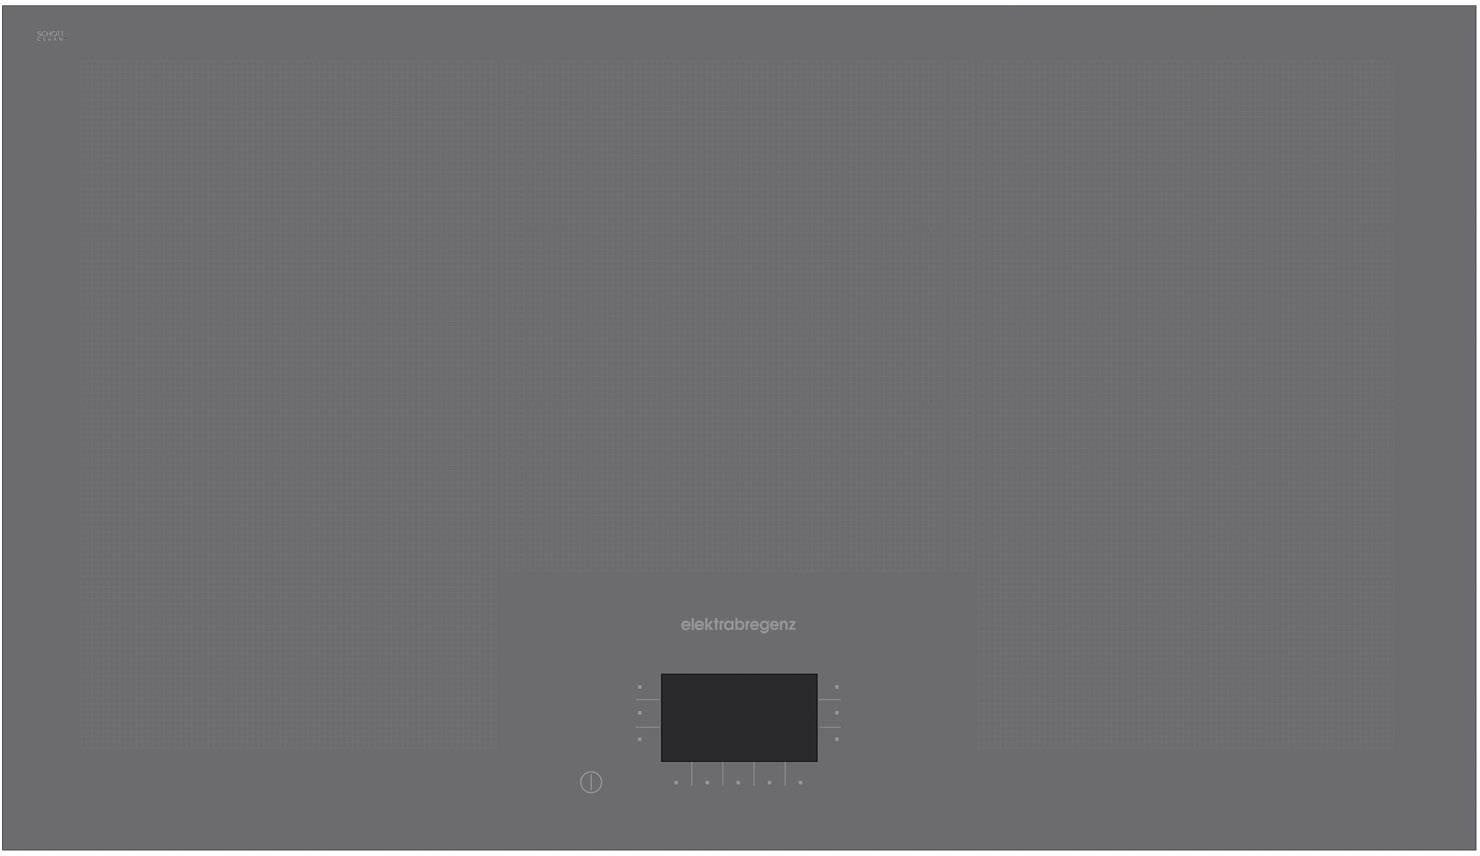 autark kochfeld cm elektra bregenz mis tf autark with autark kochfeld stunning exfxbe autarkes. Black Bedroom Furniture Sets. Home Design Ideas